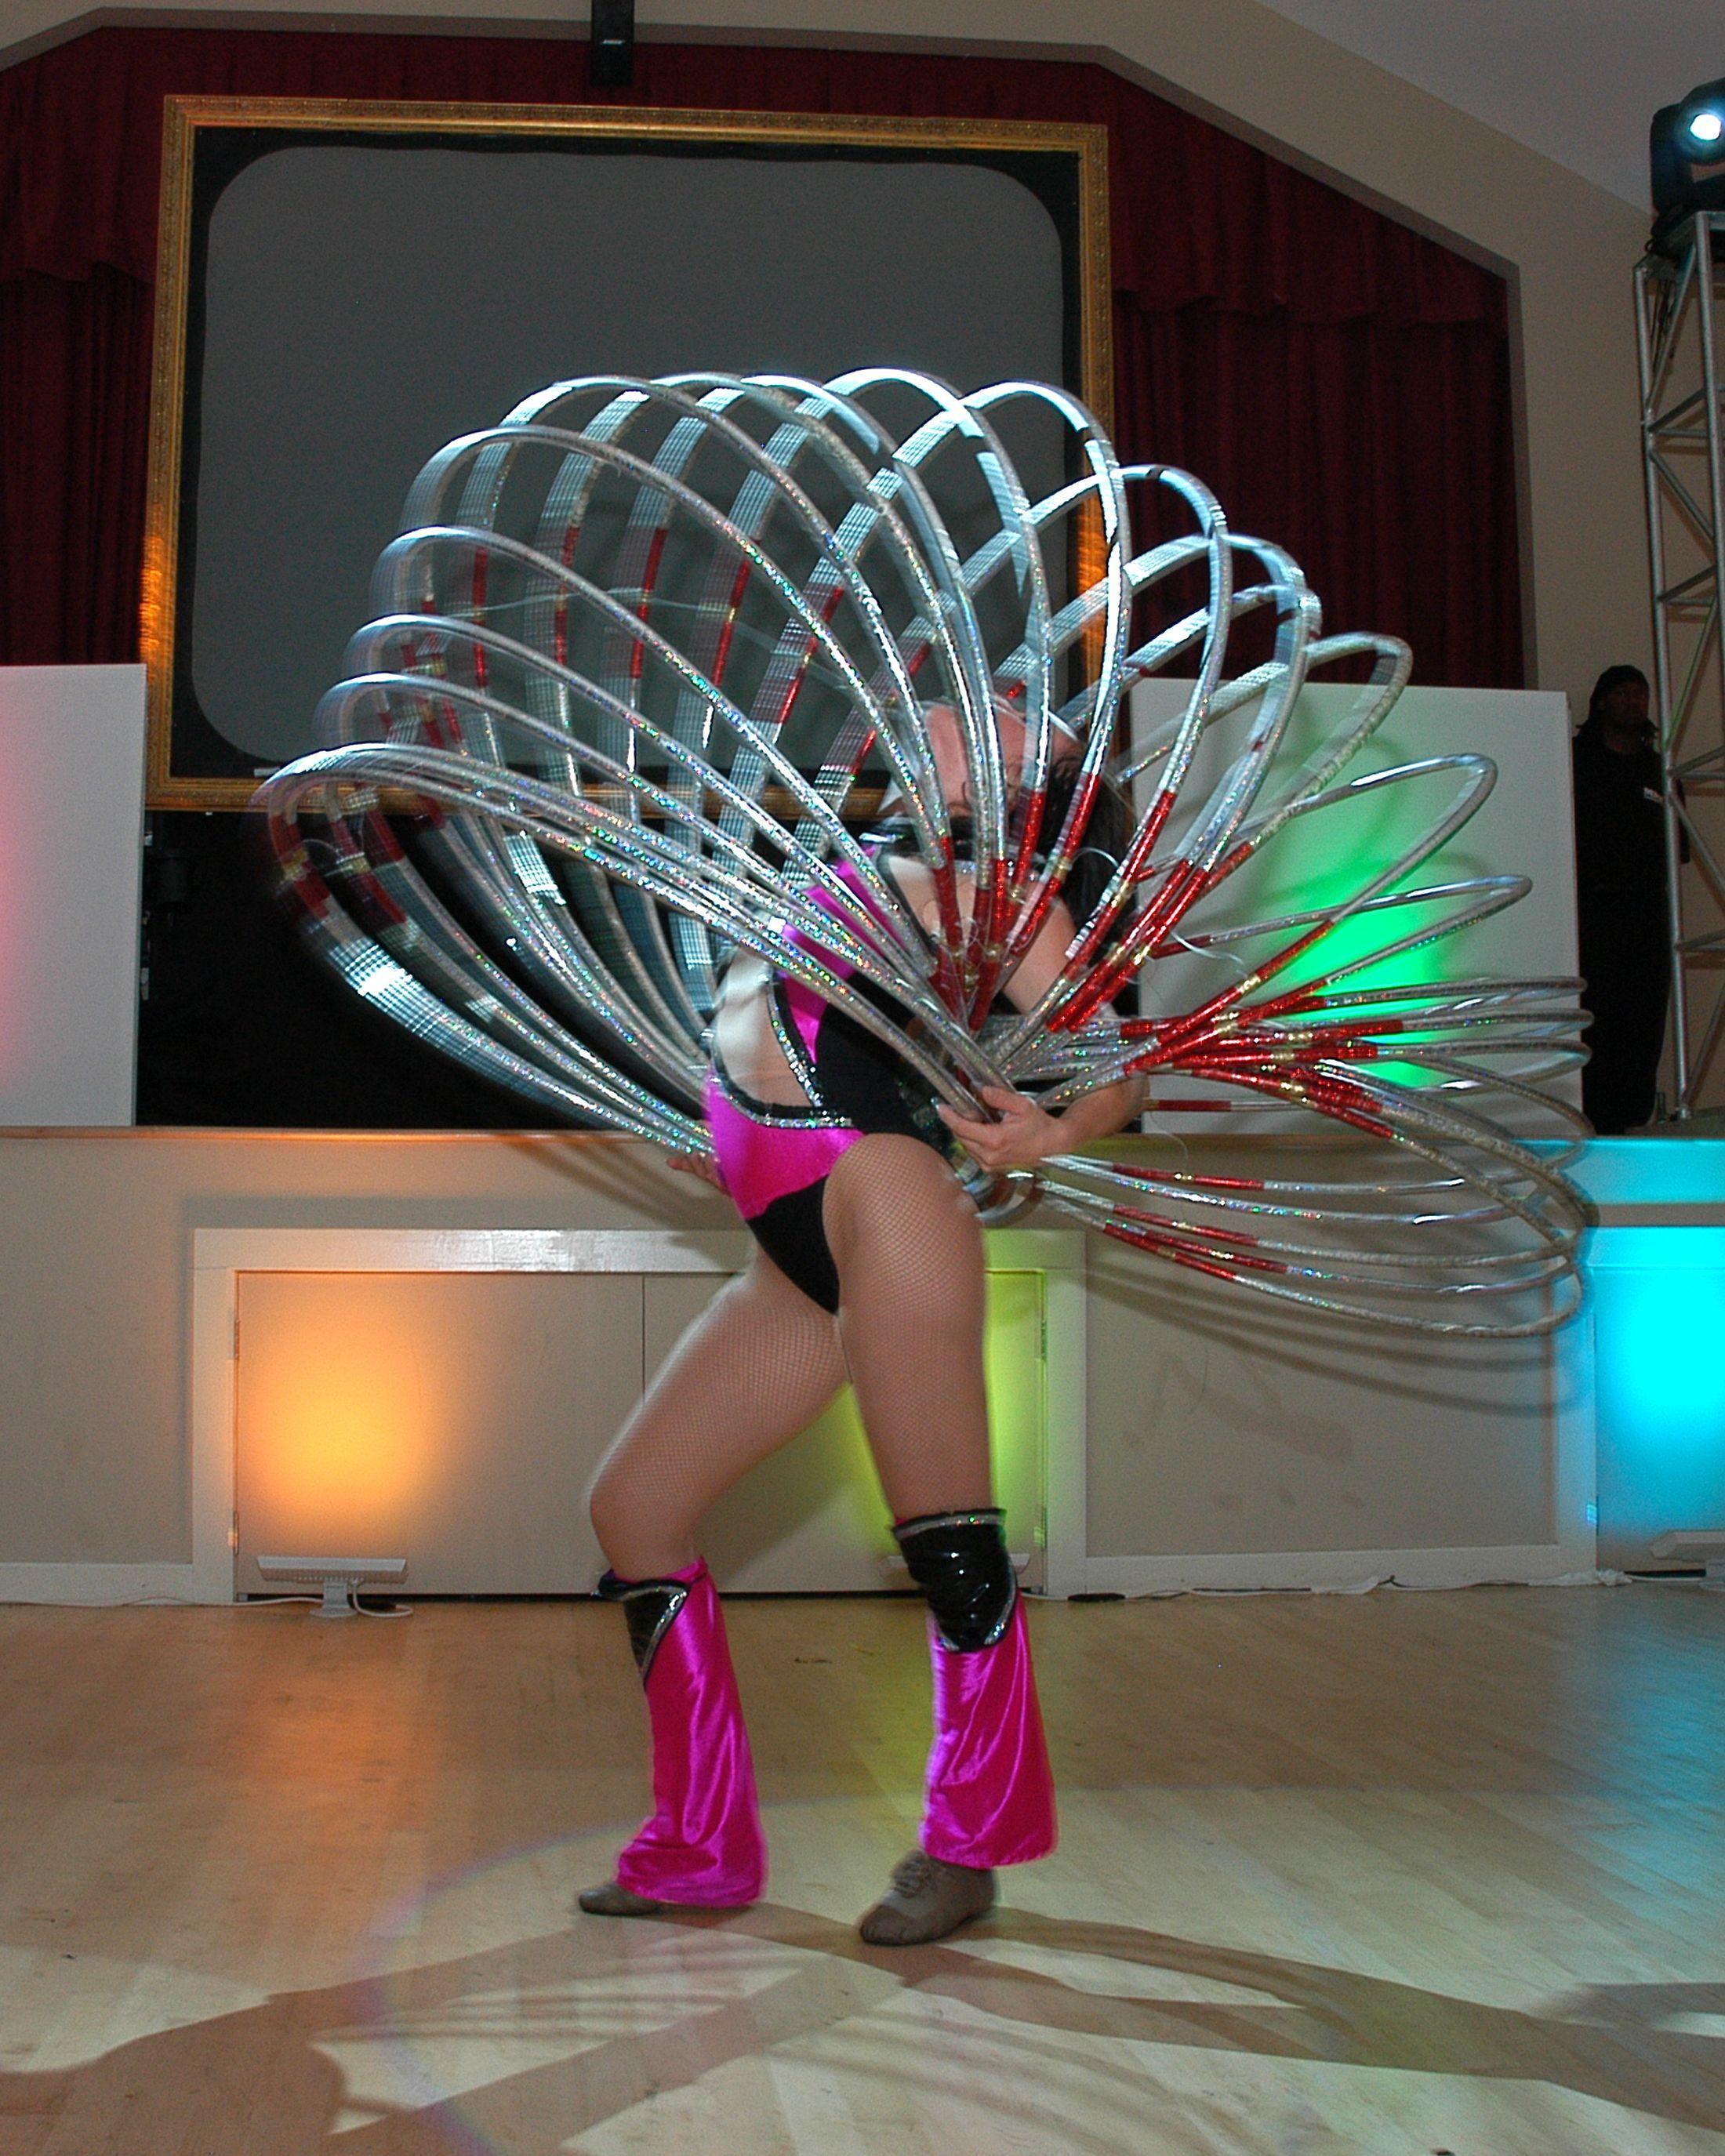 Slinky Dancer Bar Mitzvah Amp Bat Mitzvah Novelty Entertainment By Mme Event Design Amp Productions